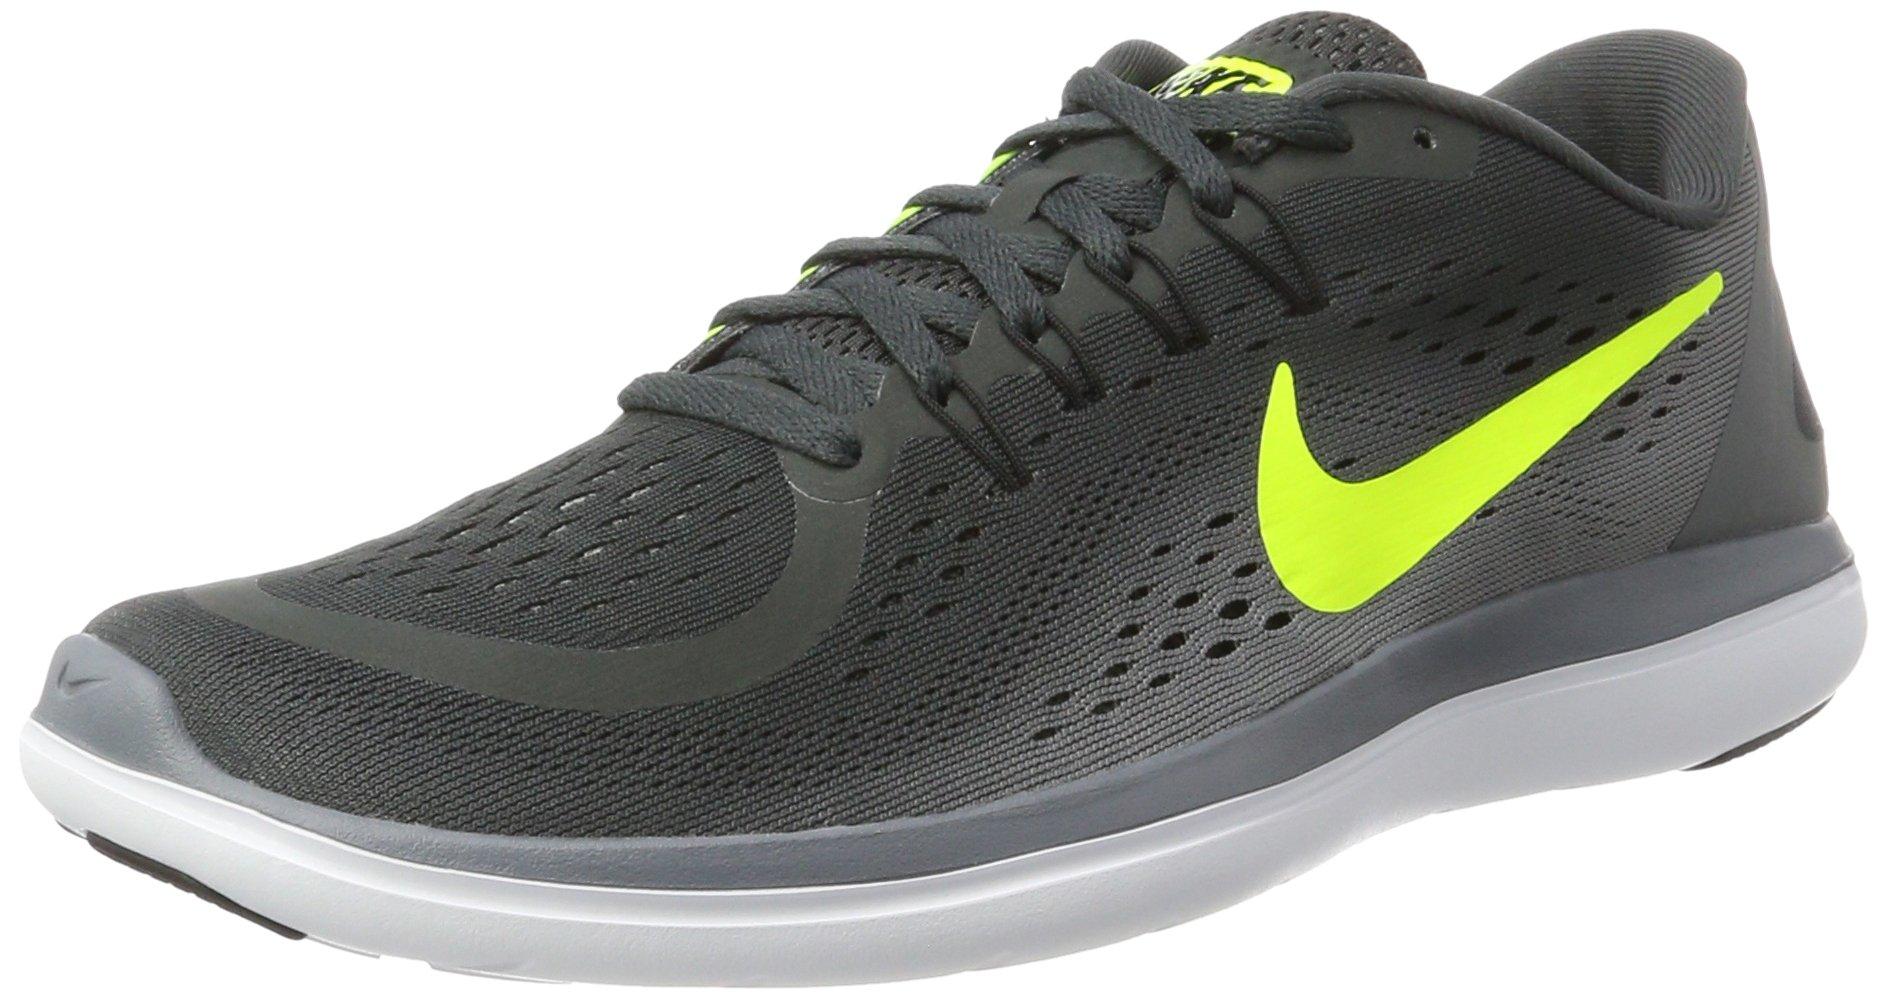 NIKE Men's Flex RN 2017 Running Shoe Anthracite/Volt/Cool Grey/Black Size 8.5 M US